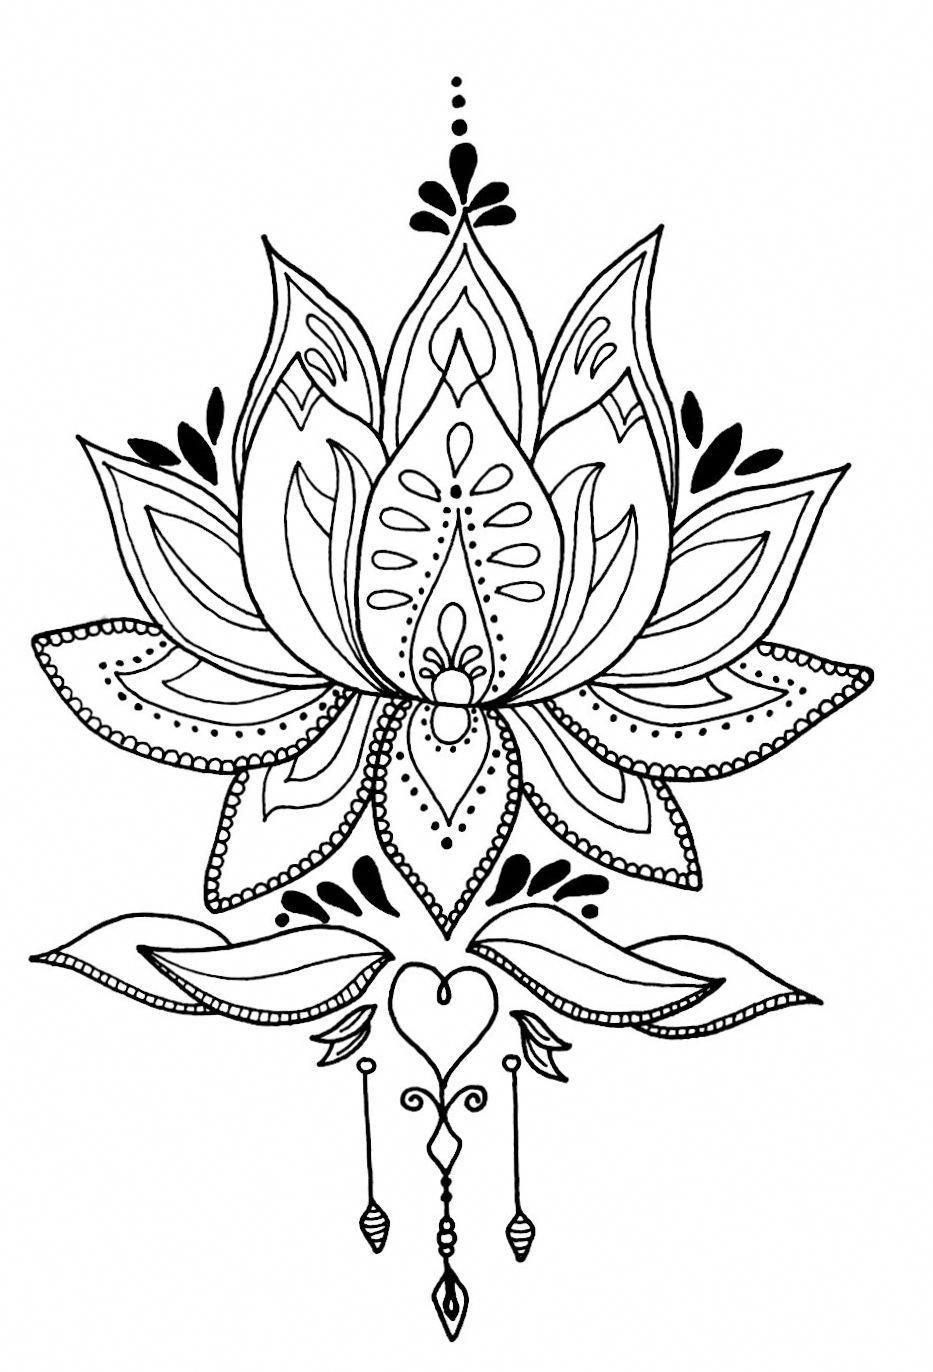 Buenodisenosdetatuajesesternon Mandalas Hindues Flores Para Dibujar Dibujo Mandala